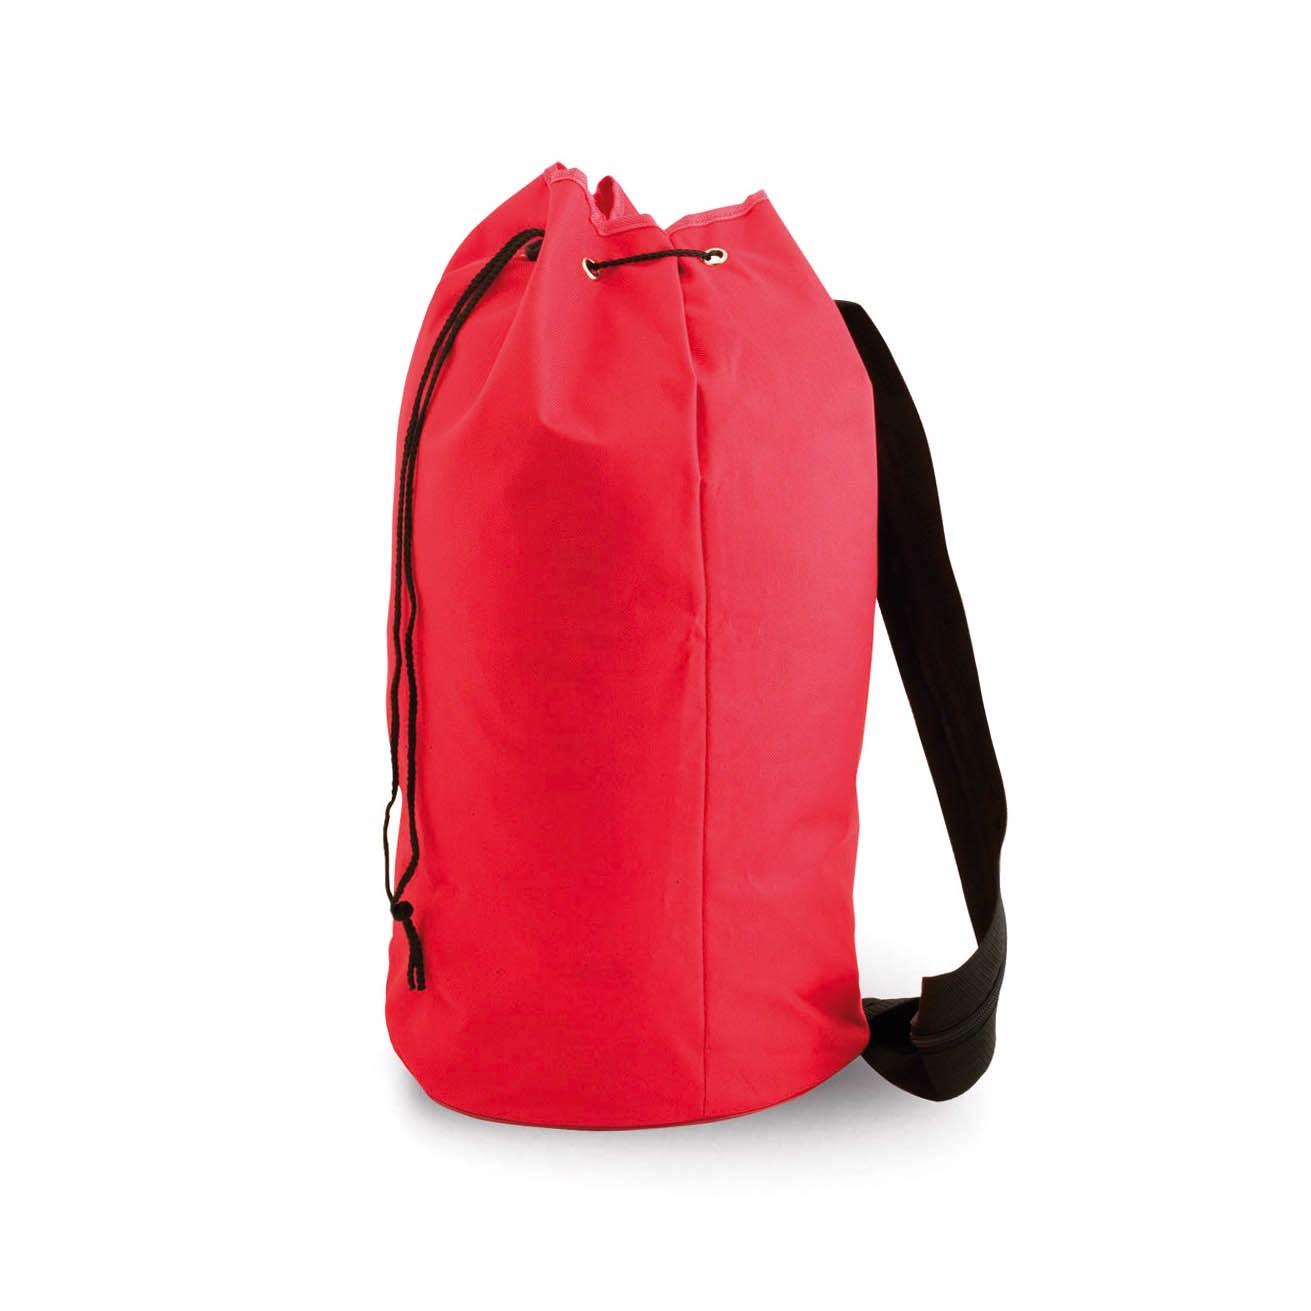 Petate Giant - Rojo